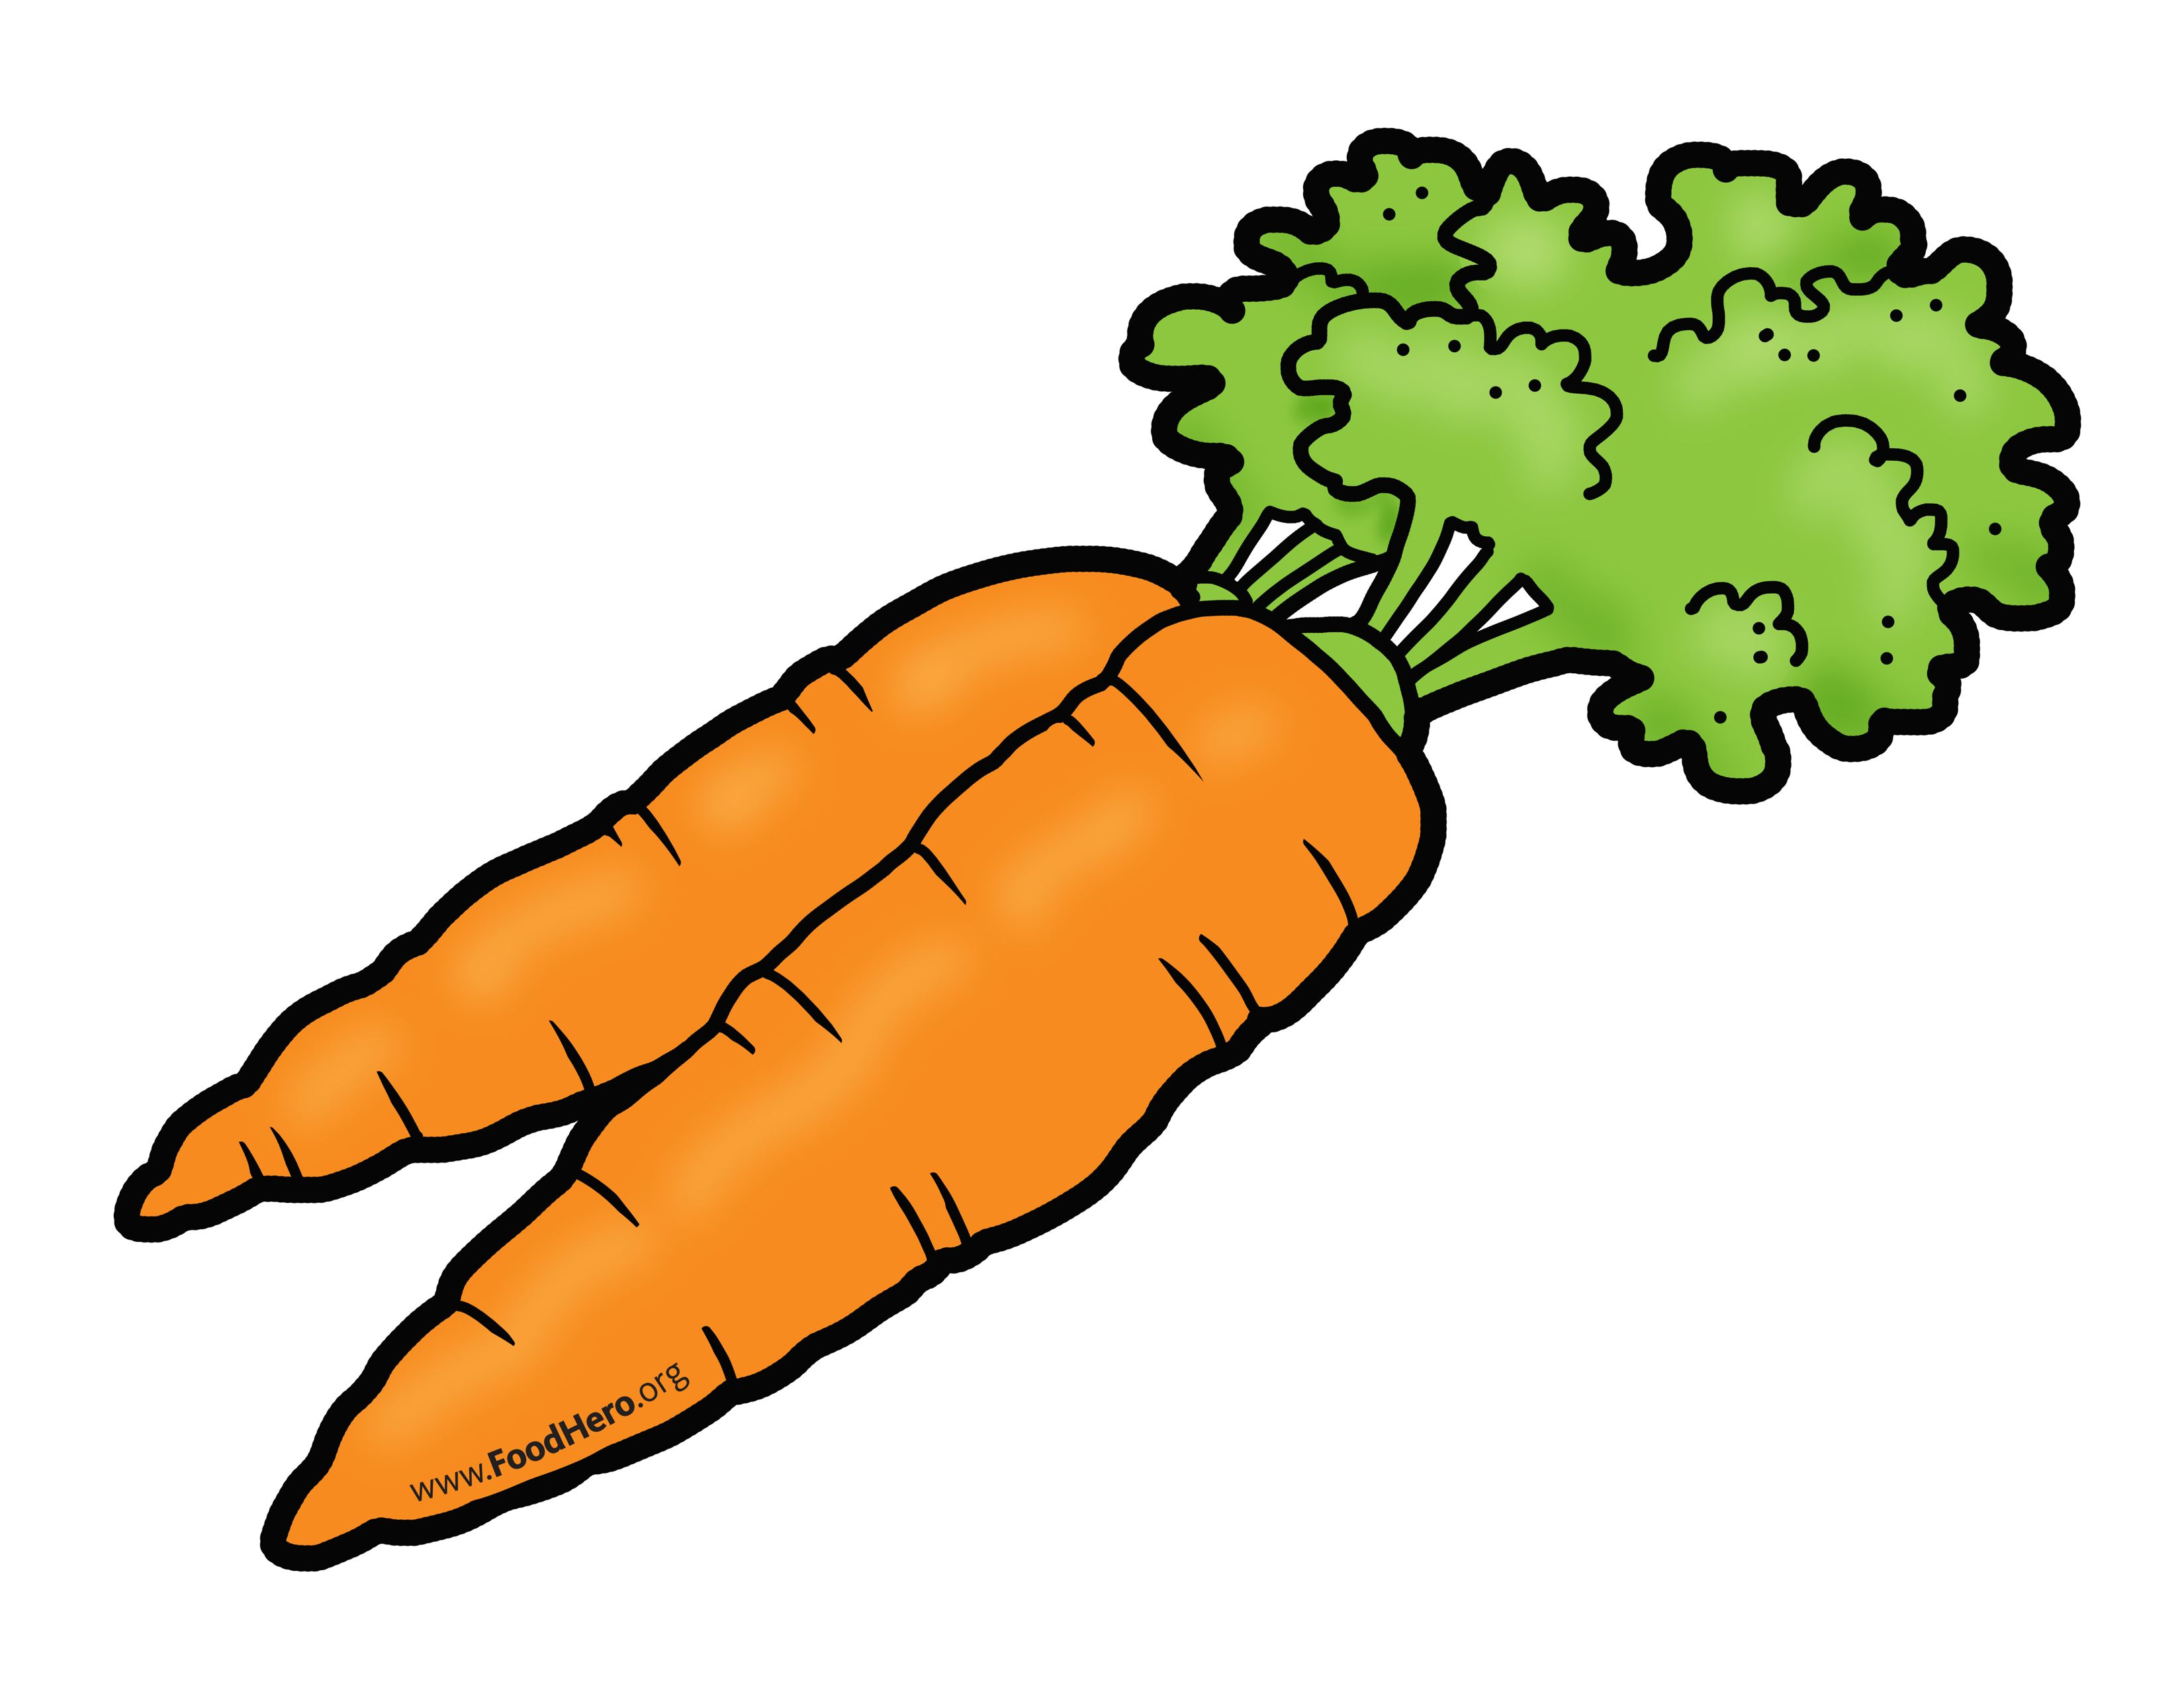 Carrots Illustration Foodhero Bullentinboards Artwork With